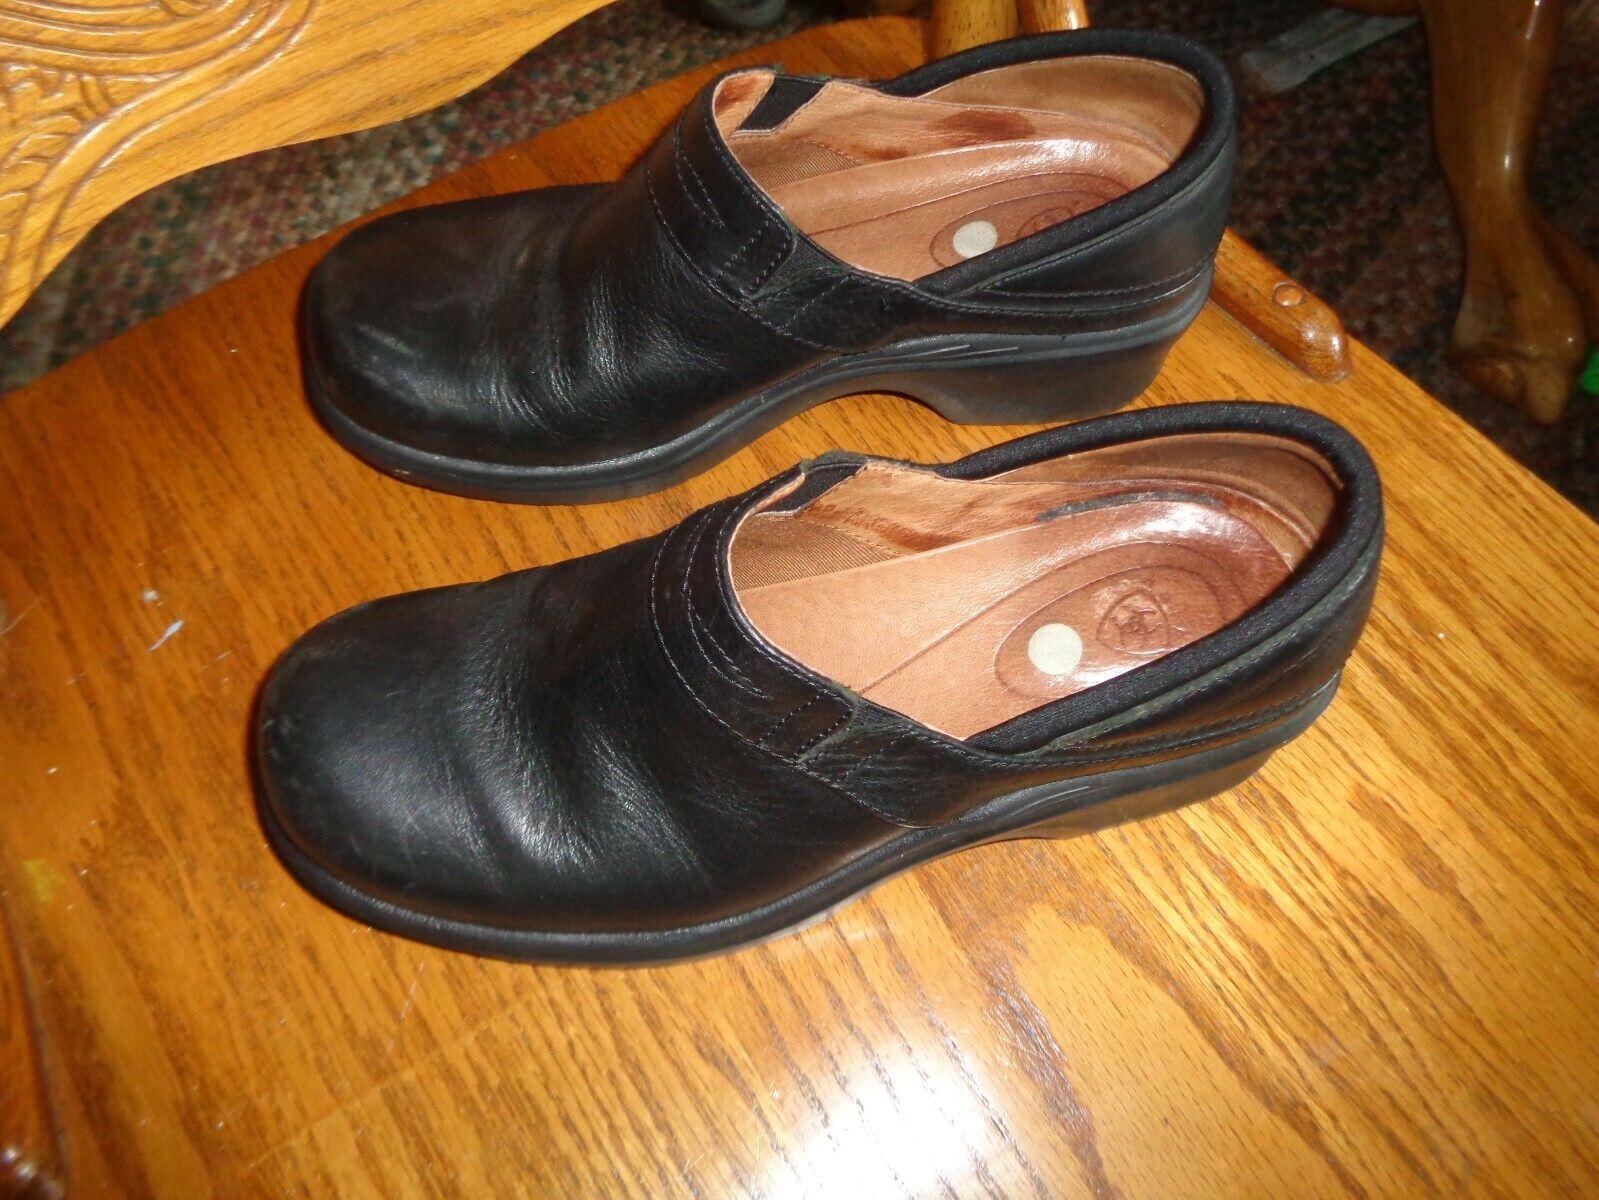 Ariat Women's Shoes Clogs Black Leather Size 7.5 B Medium